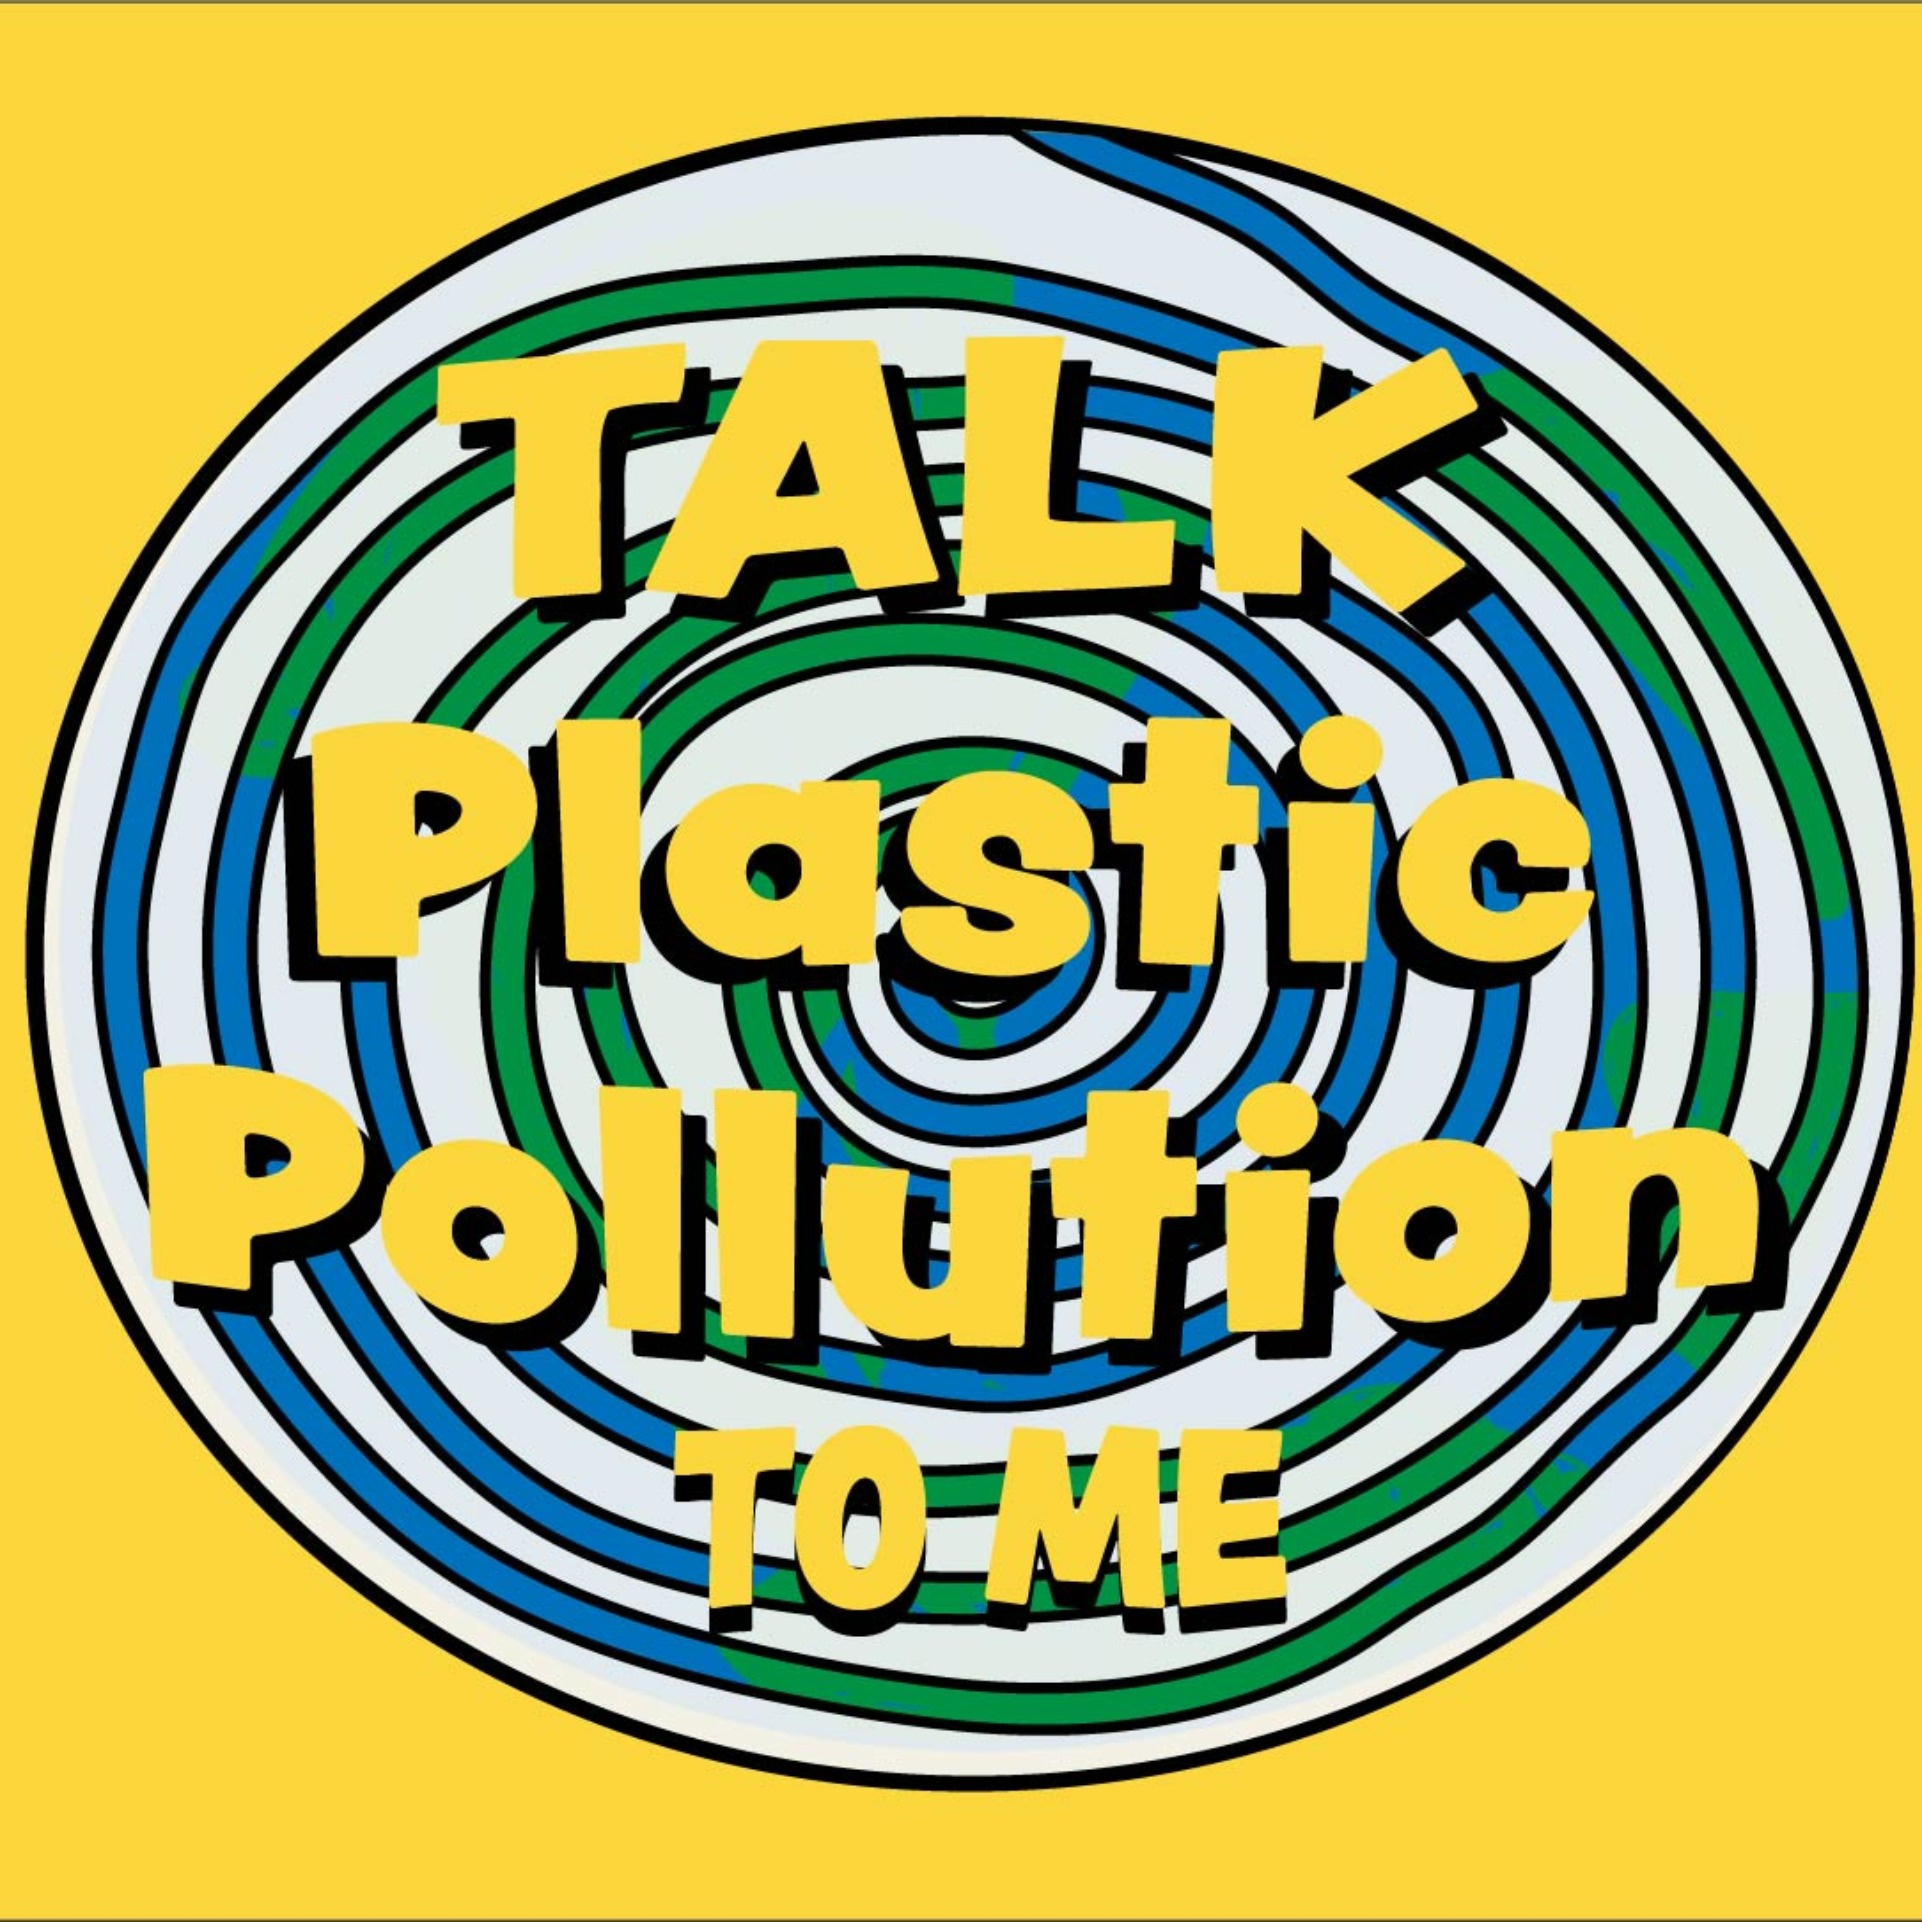 Talk Plastic Pollution to Me